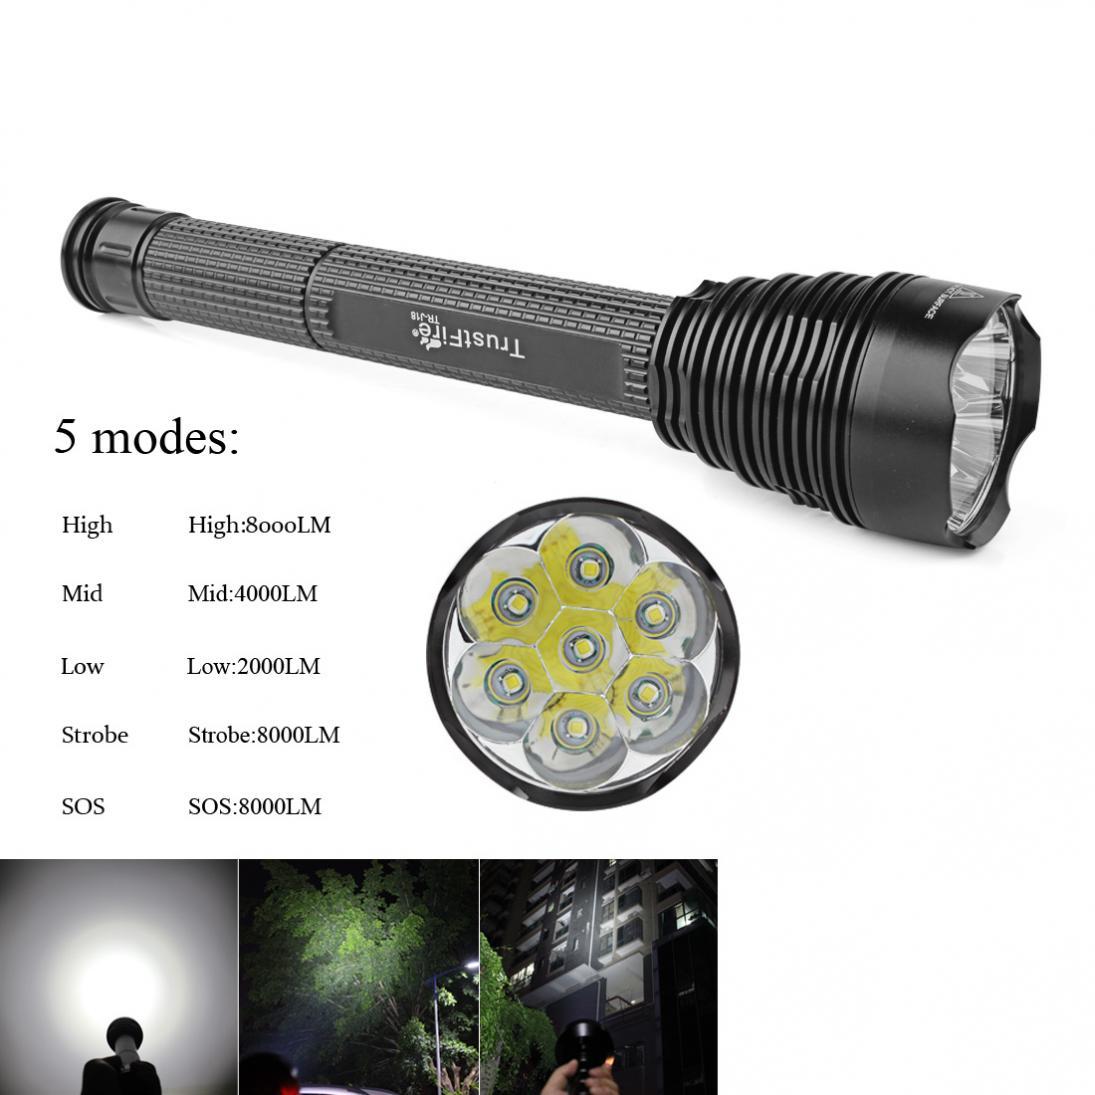 купить Sale TrustFire J18 7 x XM_L2 Super Bright 8000Lm 5 Modes Waterproof Extended LED Flashlight 18650 / 26650 Torch Light онлайн